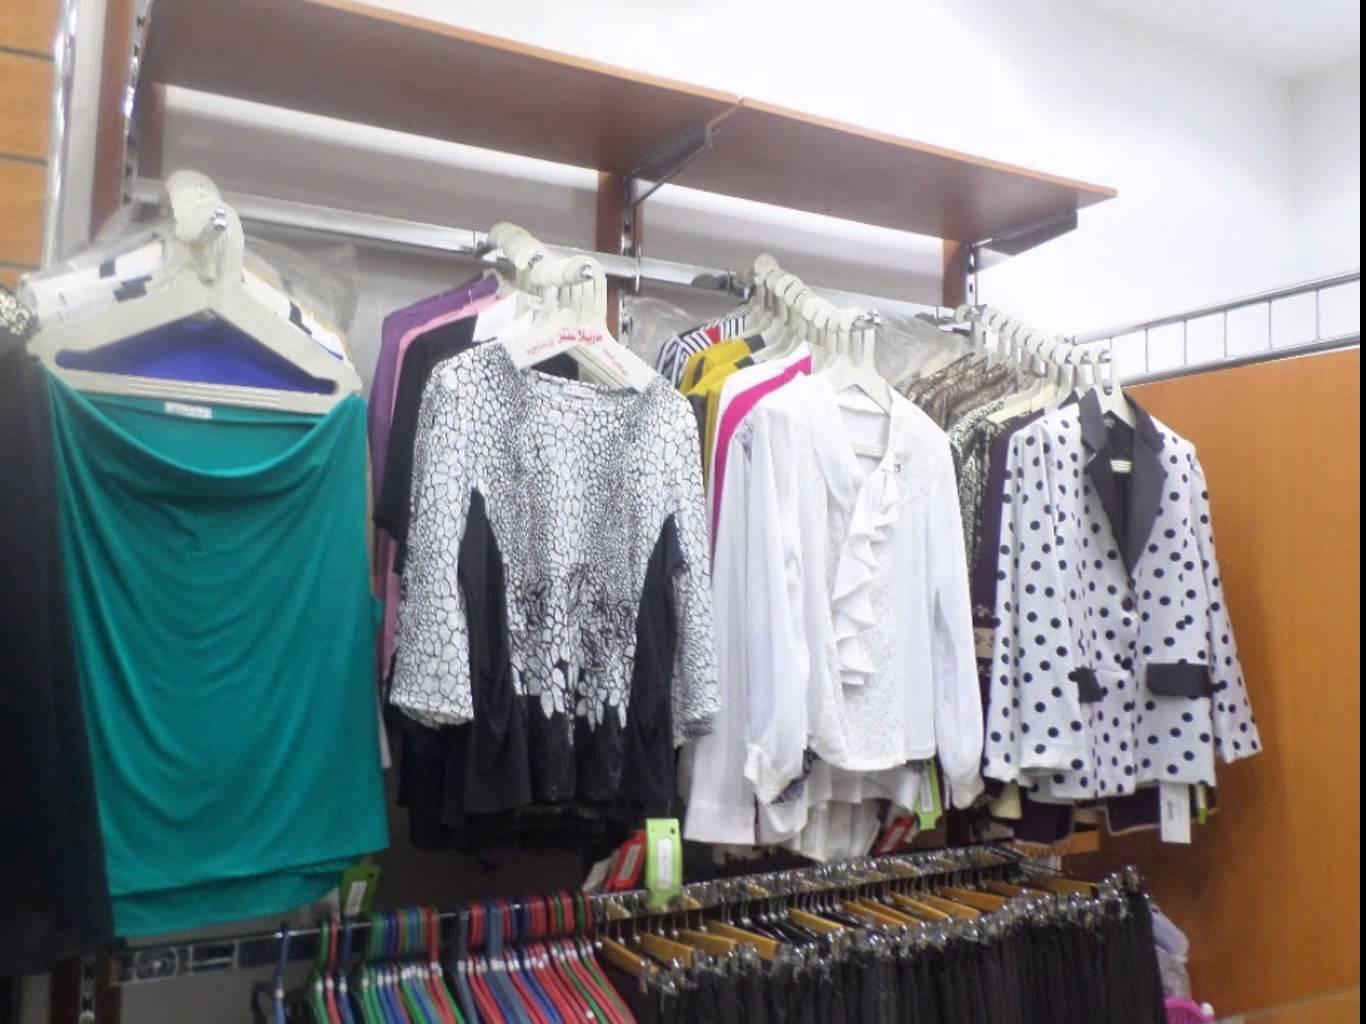 بالصور محلات ملابس , تعرف على احدث موديلات ملابس بالمحلات 1939 6